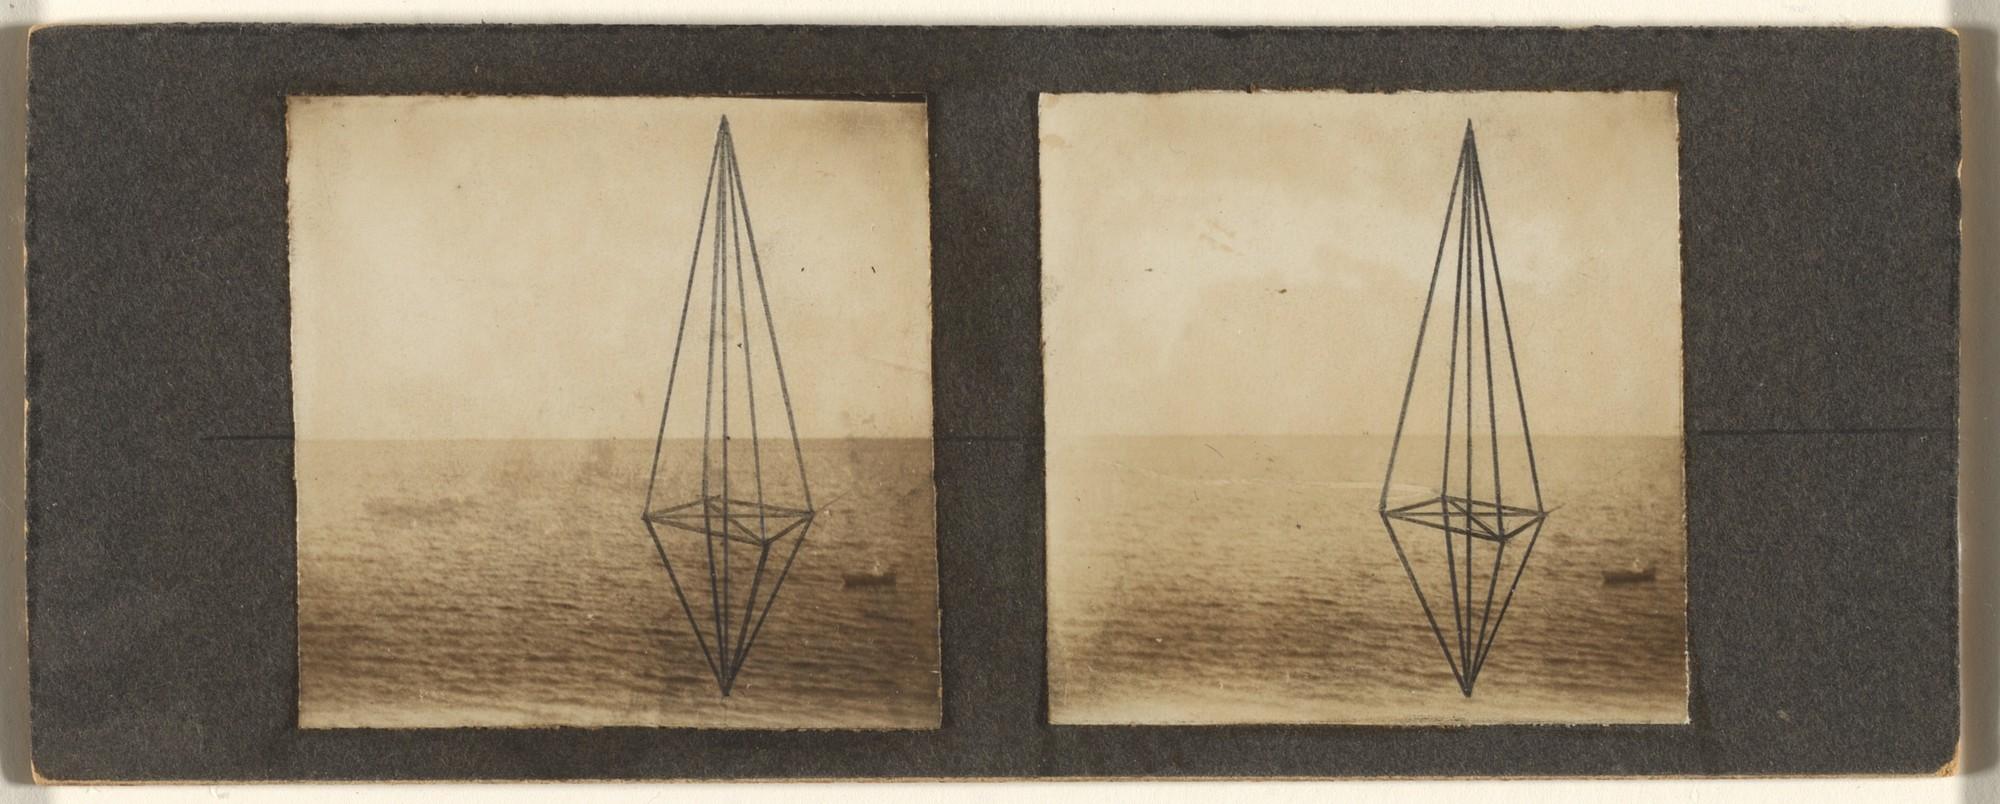 Marcel Duchamp. Stereoscopie a la main.